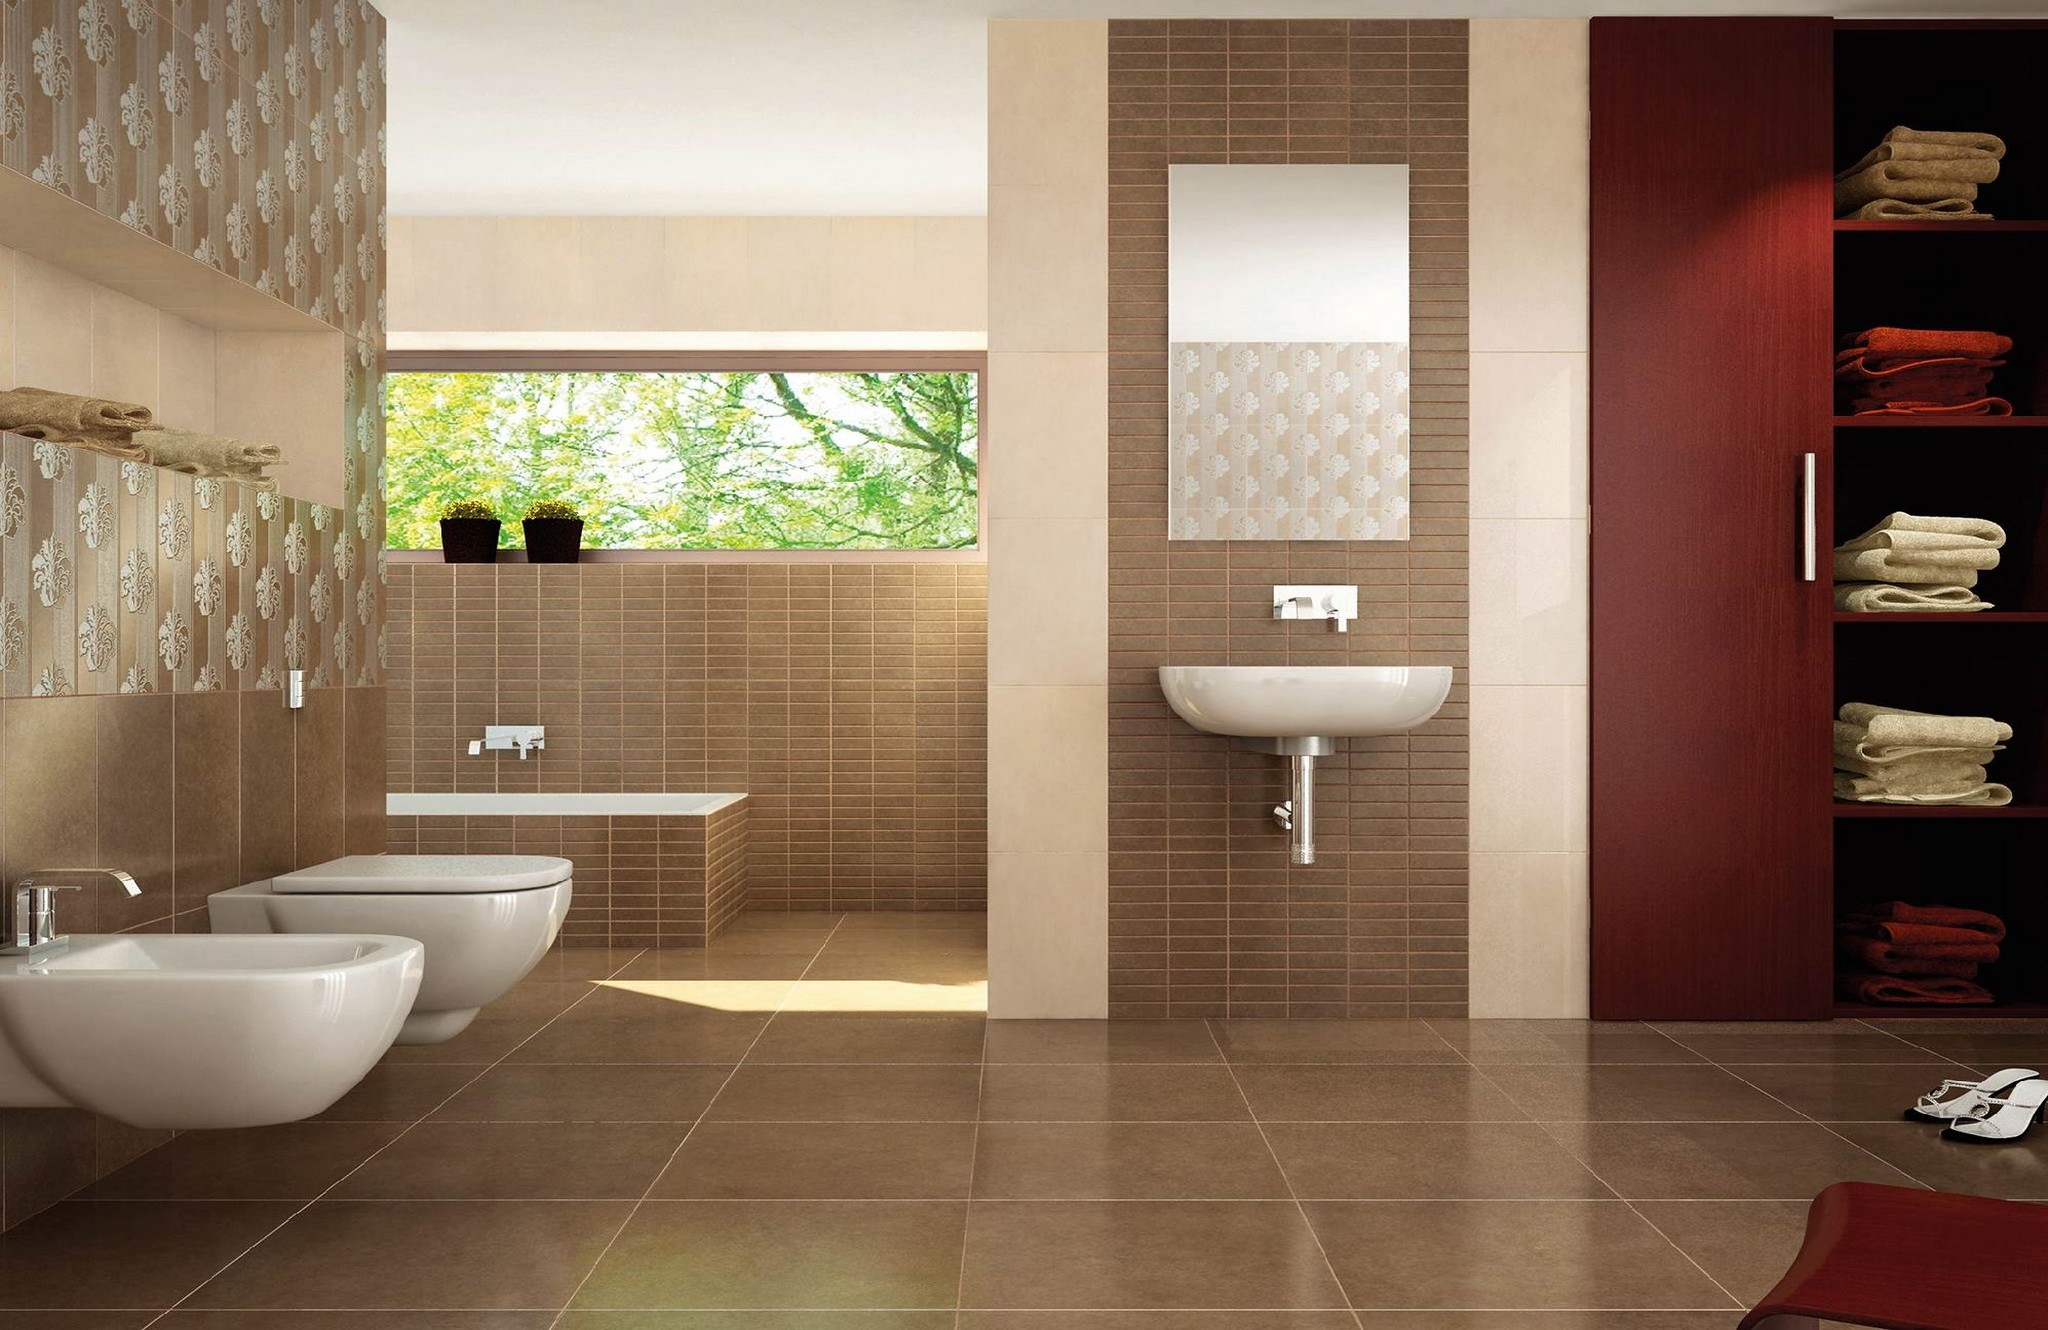 Faience salle de bain cifre serie boston 25x40 1 choix Faience et carrelage